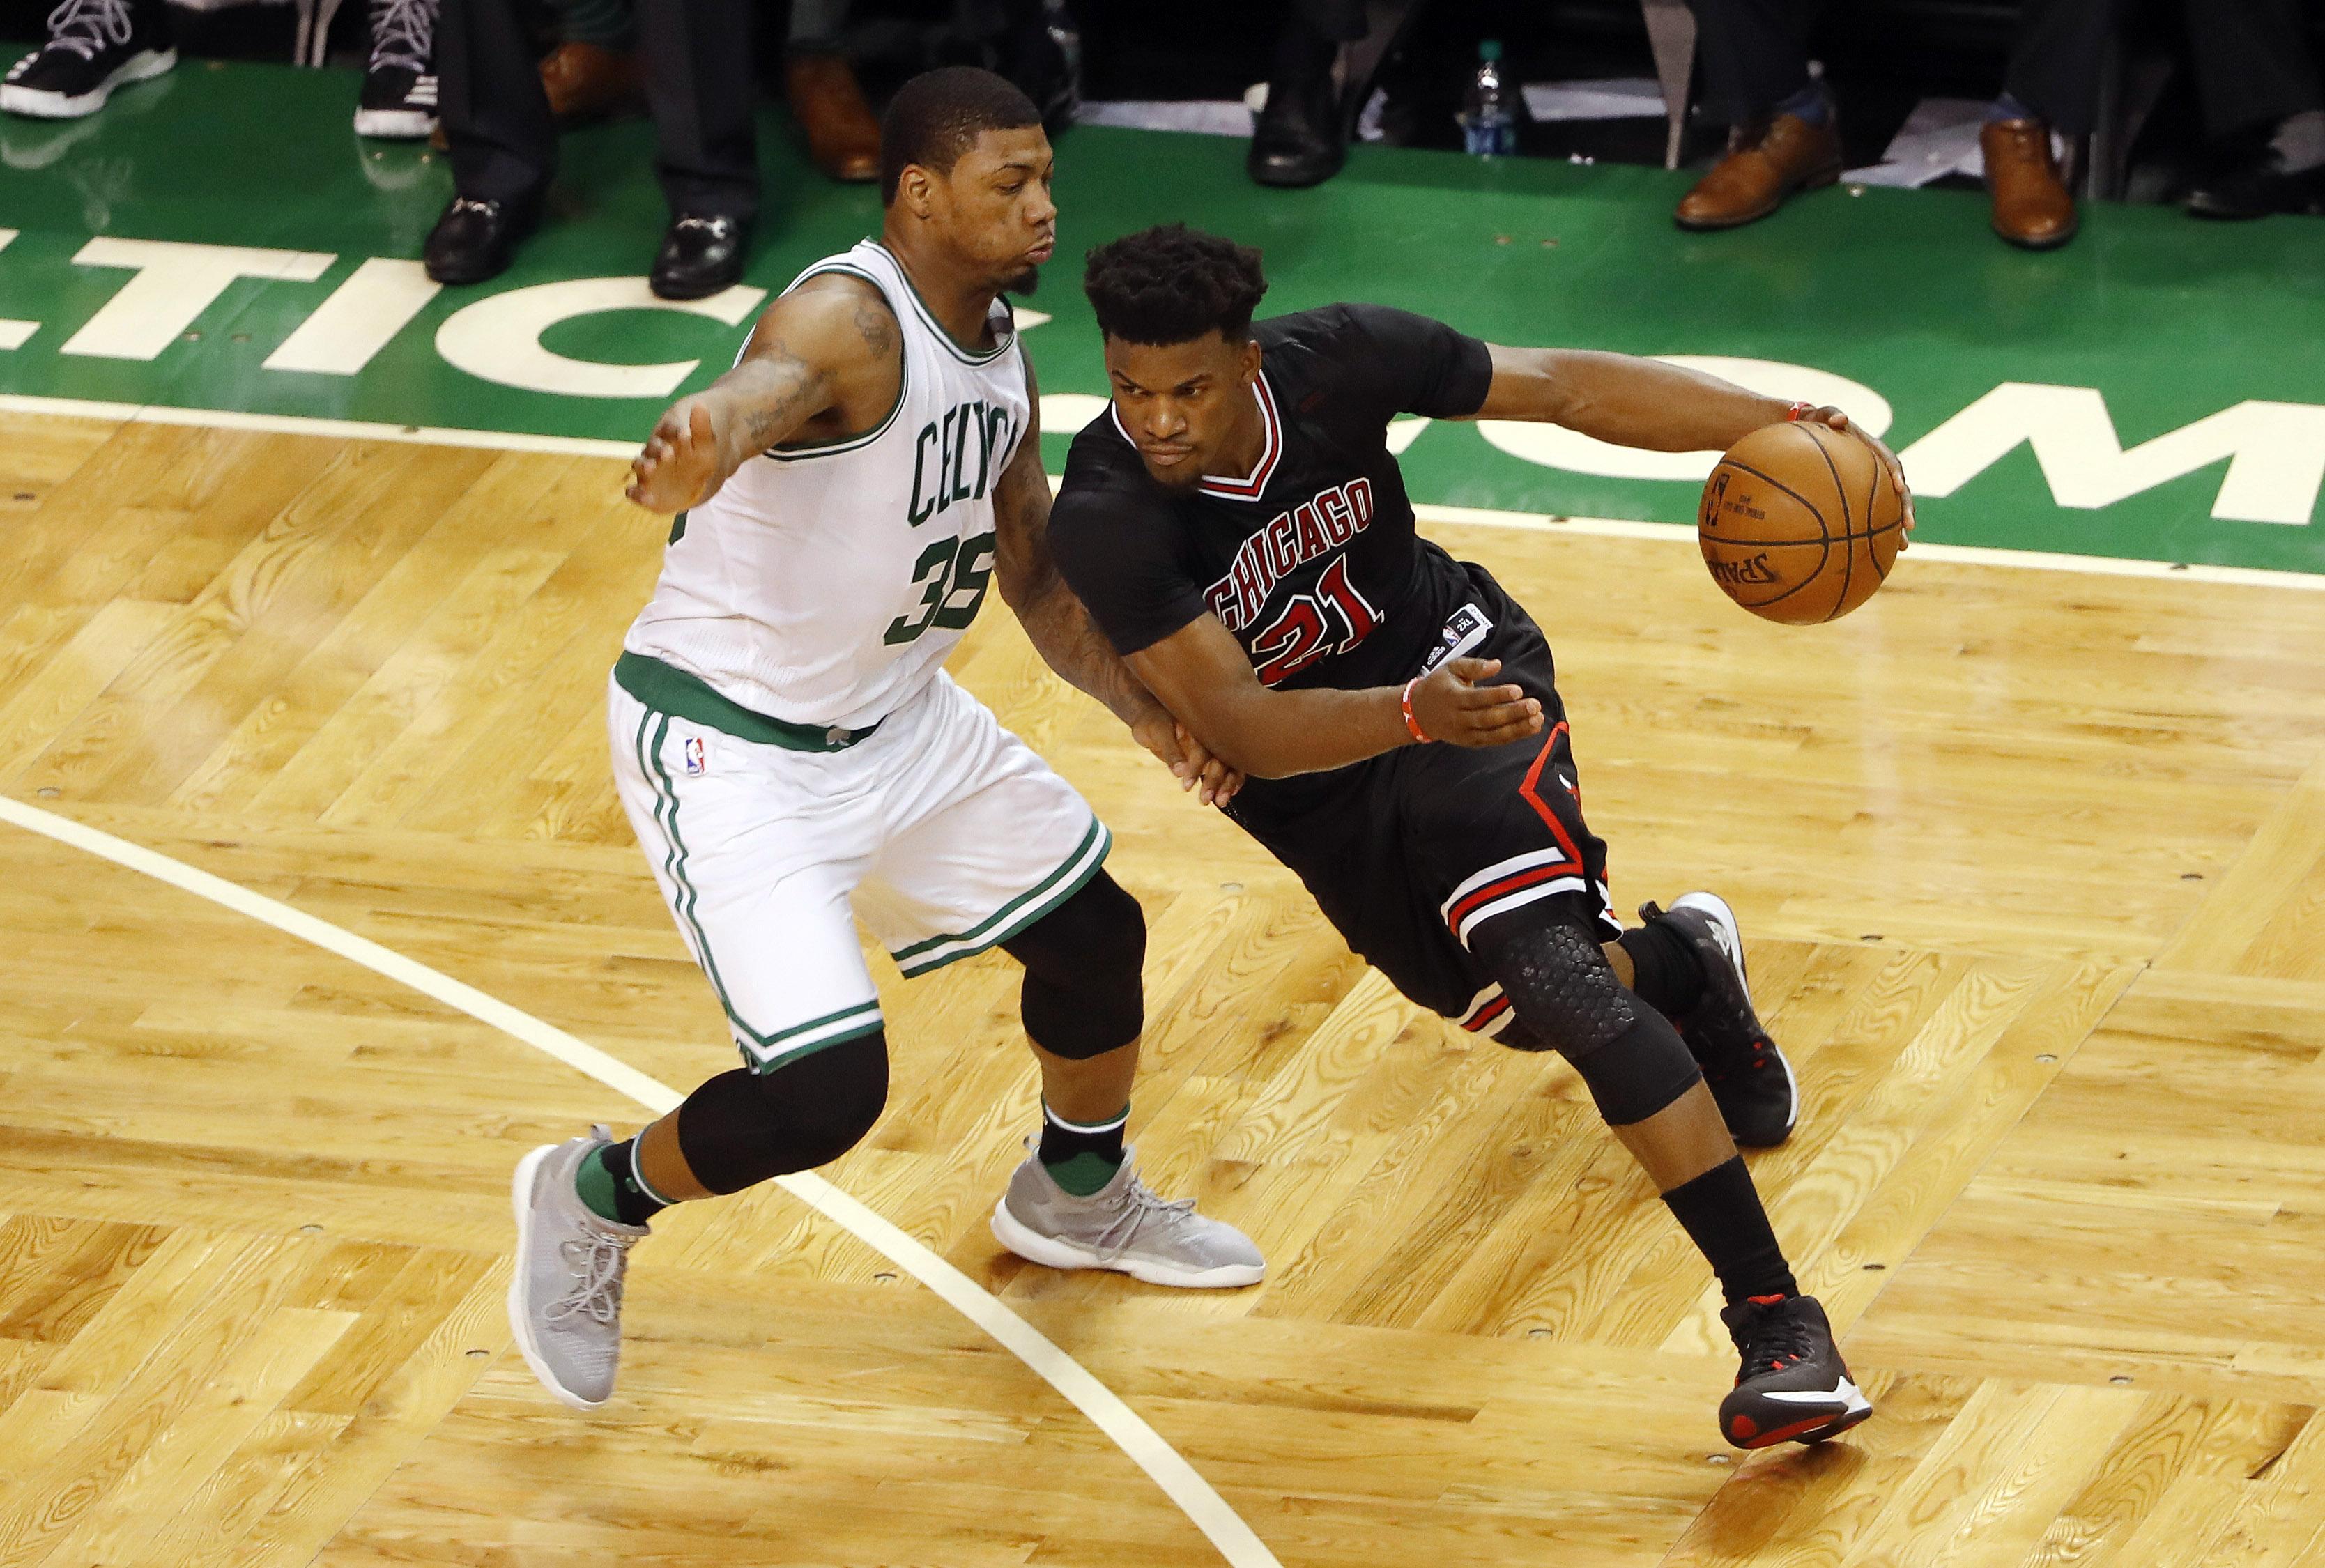 10016785-nba-playoffs-chicago-bulls-at-boston-celtics-1